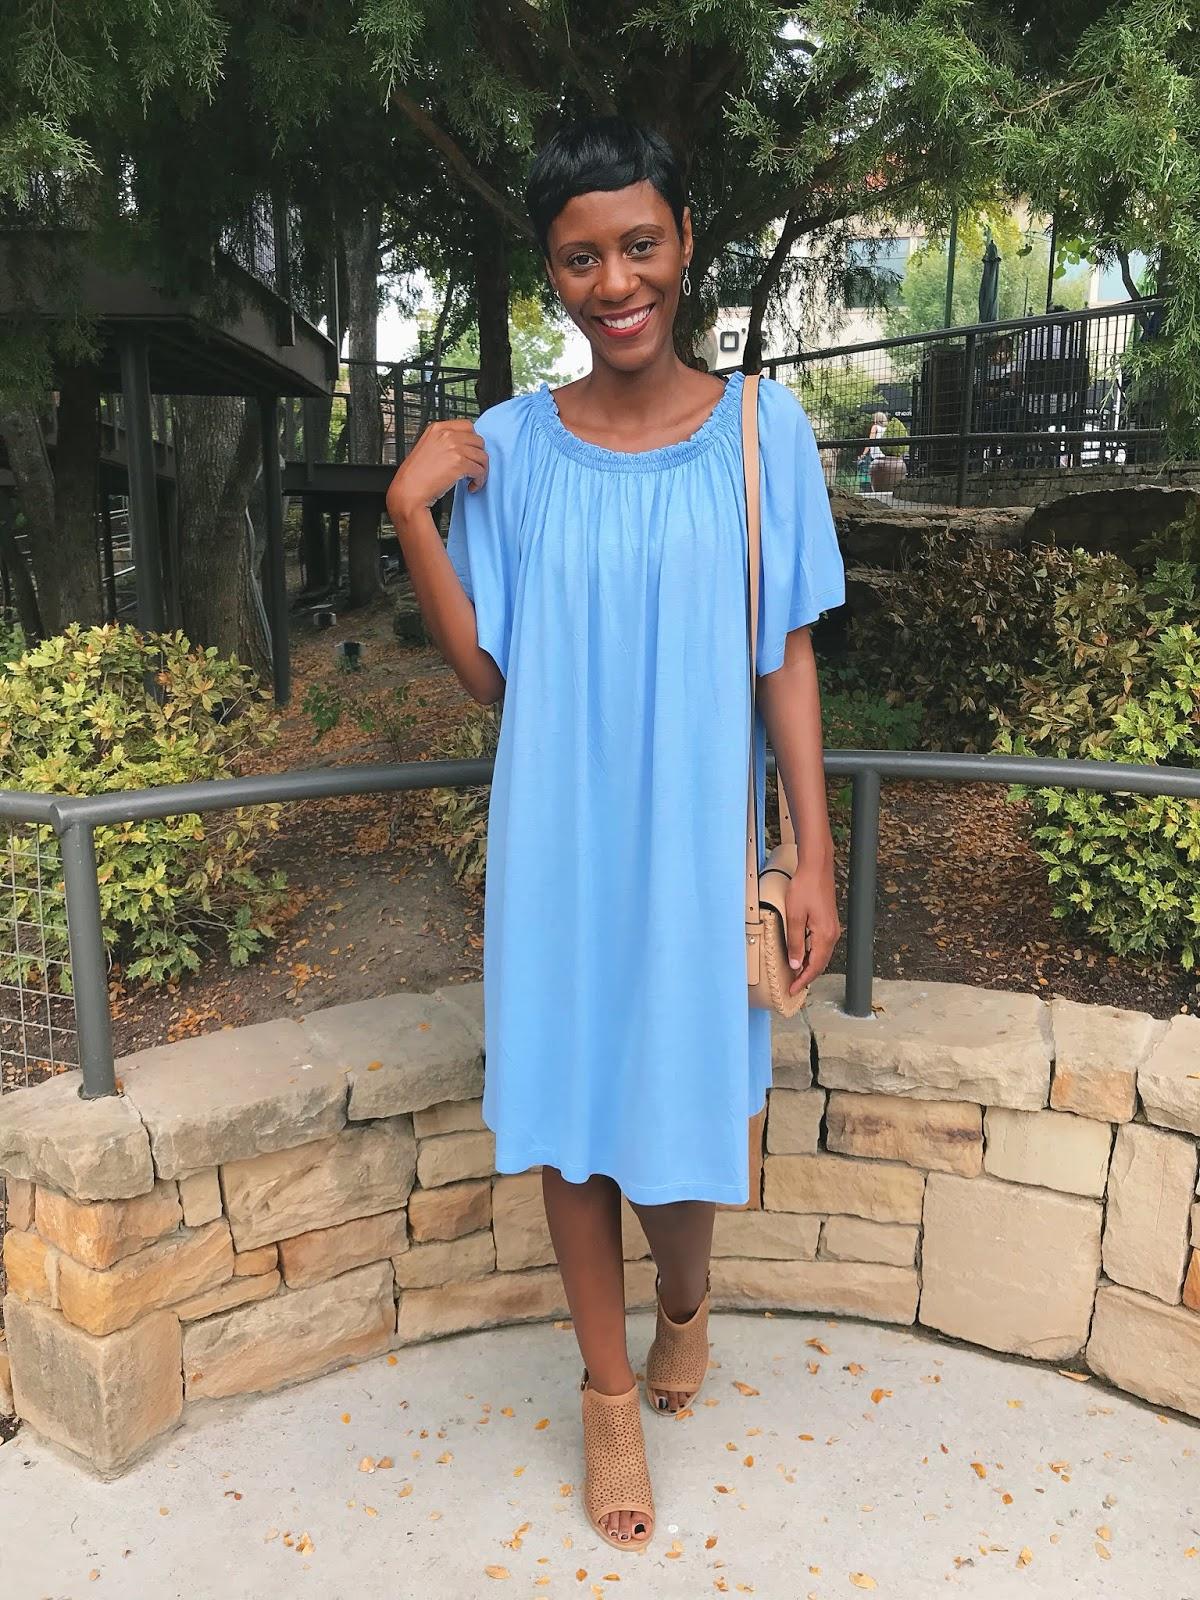 Little Blue Dress On A Monday